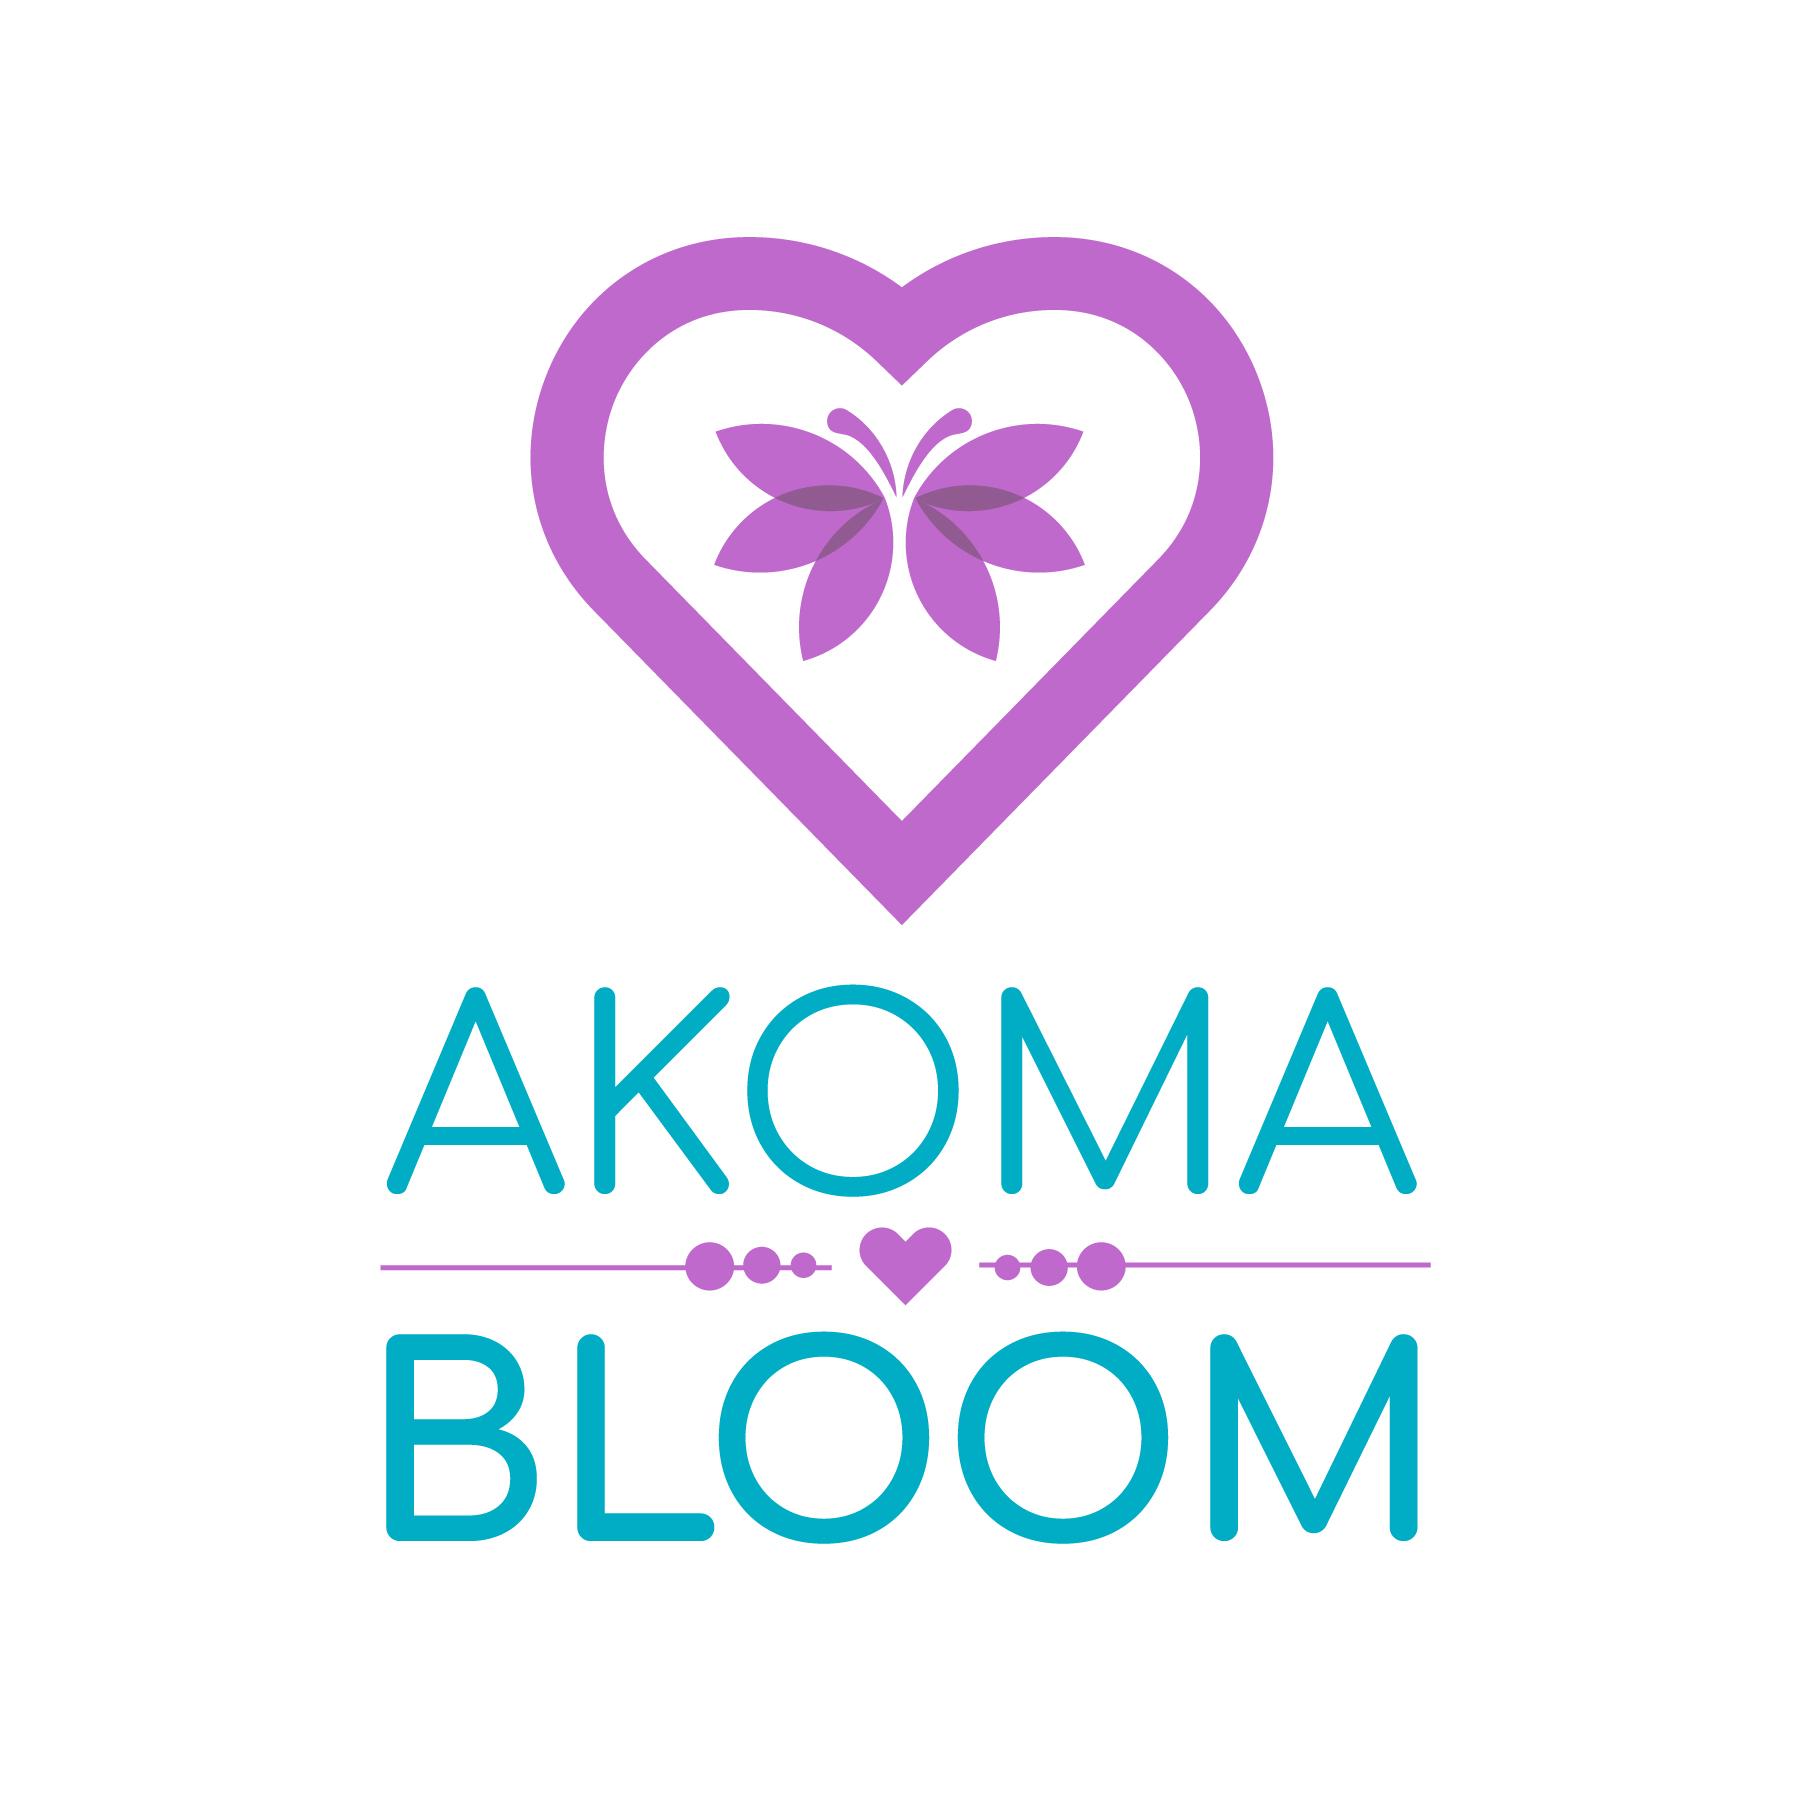 Akoma_Bloom-03.jpg